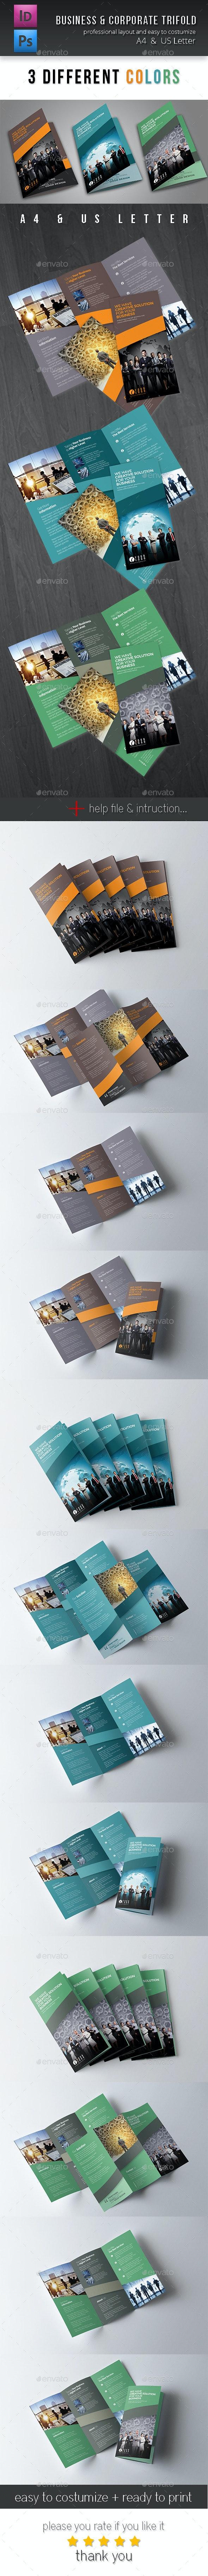 Trifold Brochure Vol. 2 - Corporate Brochures